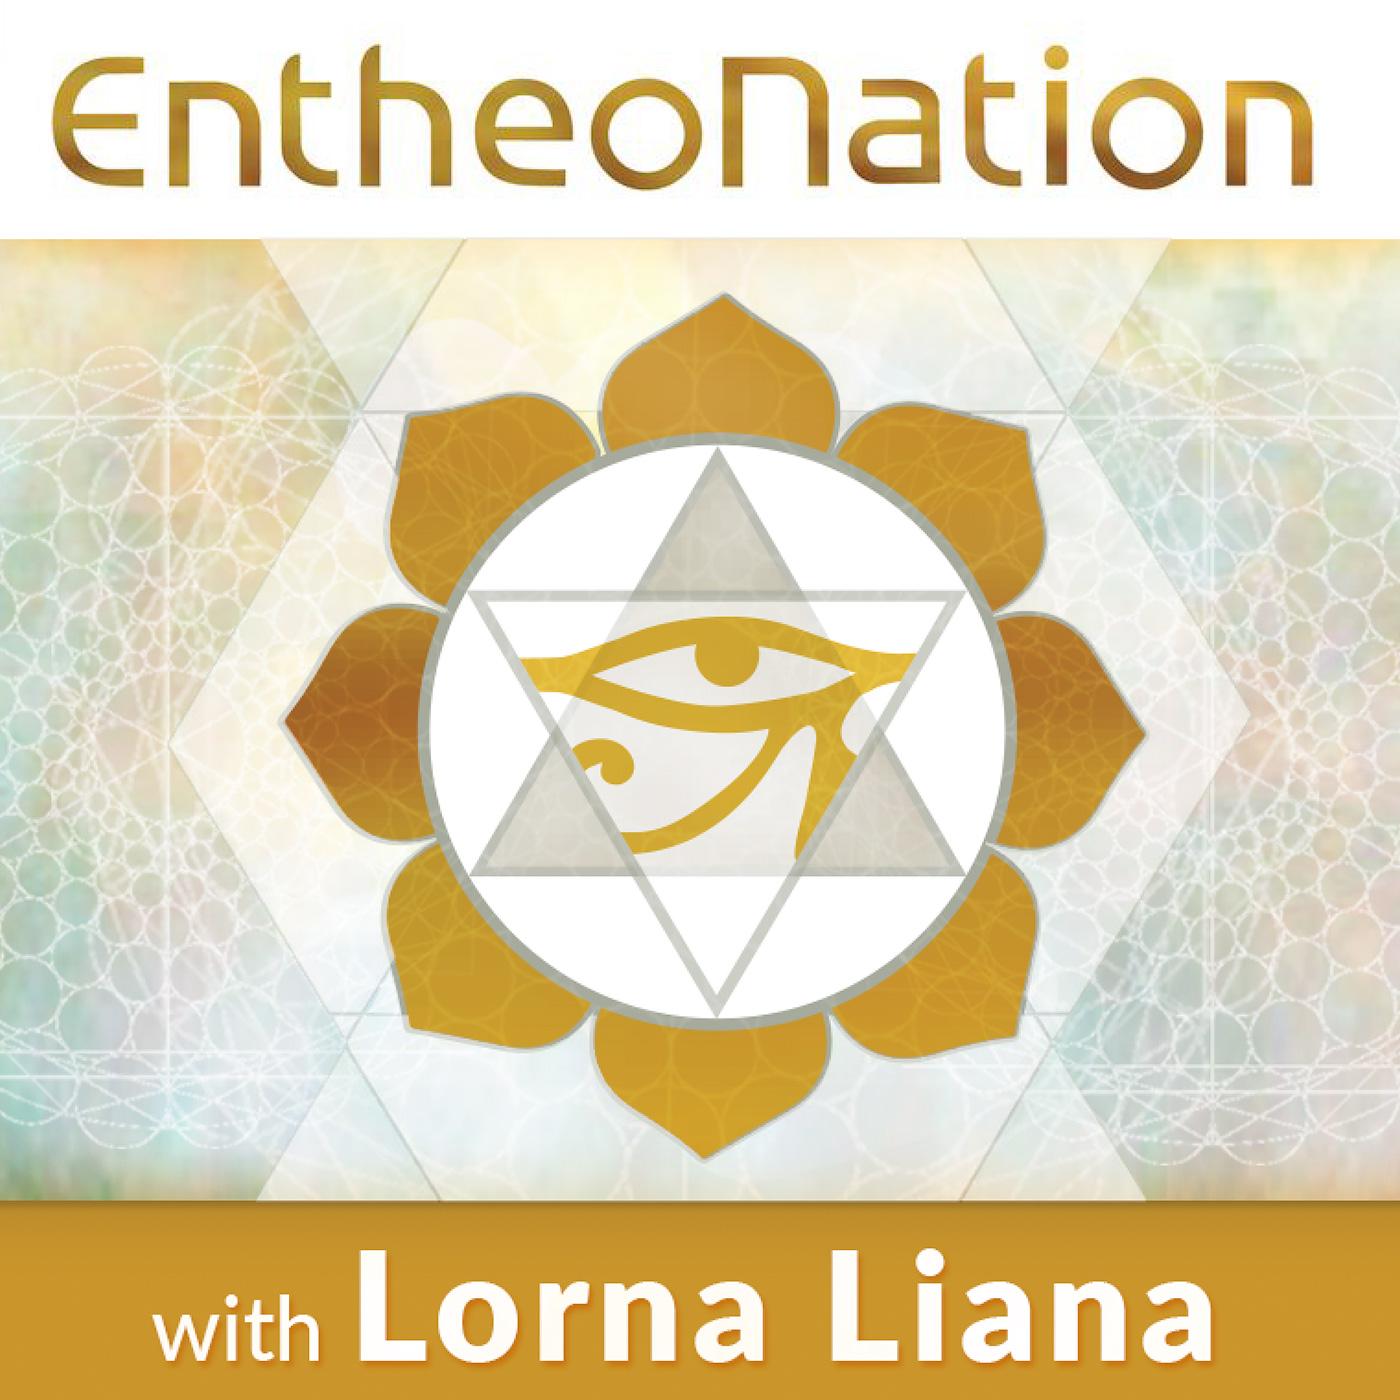 entheonation-artwork.jpg